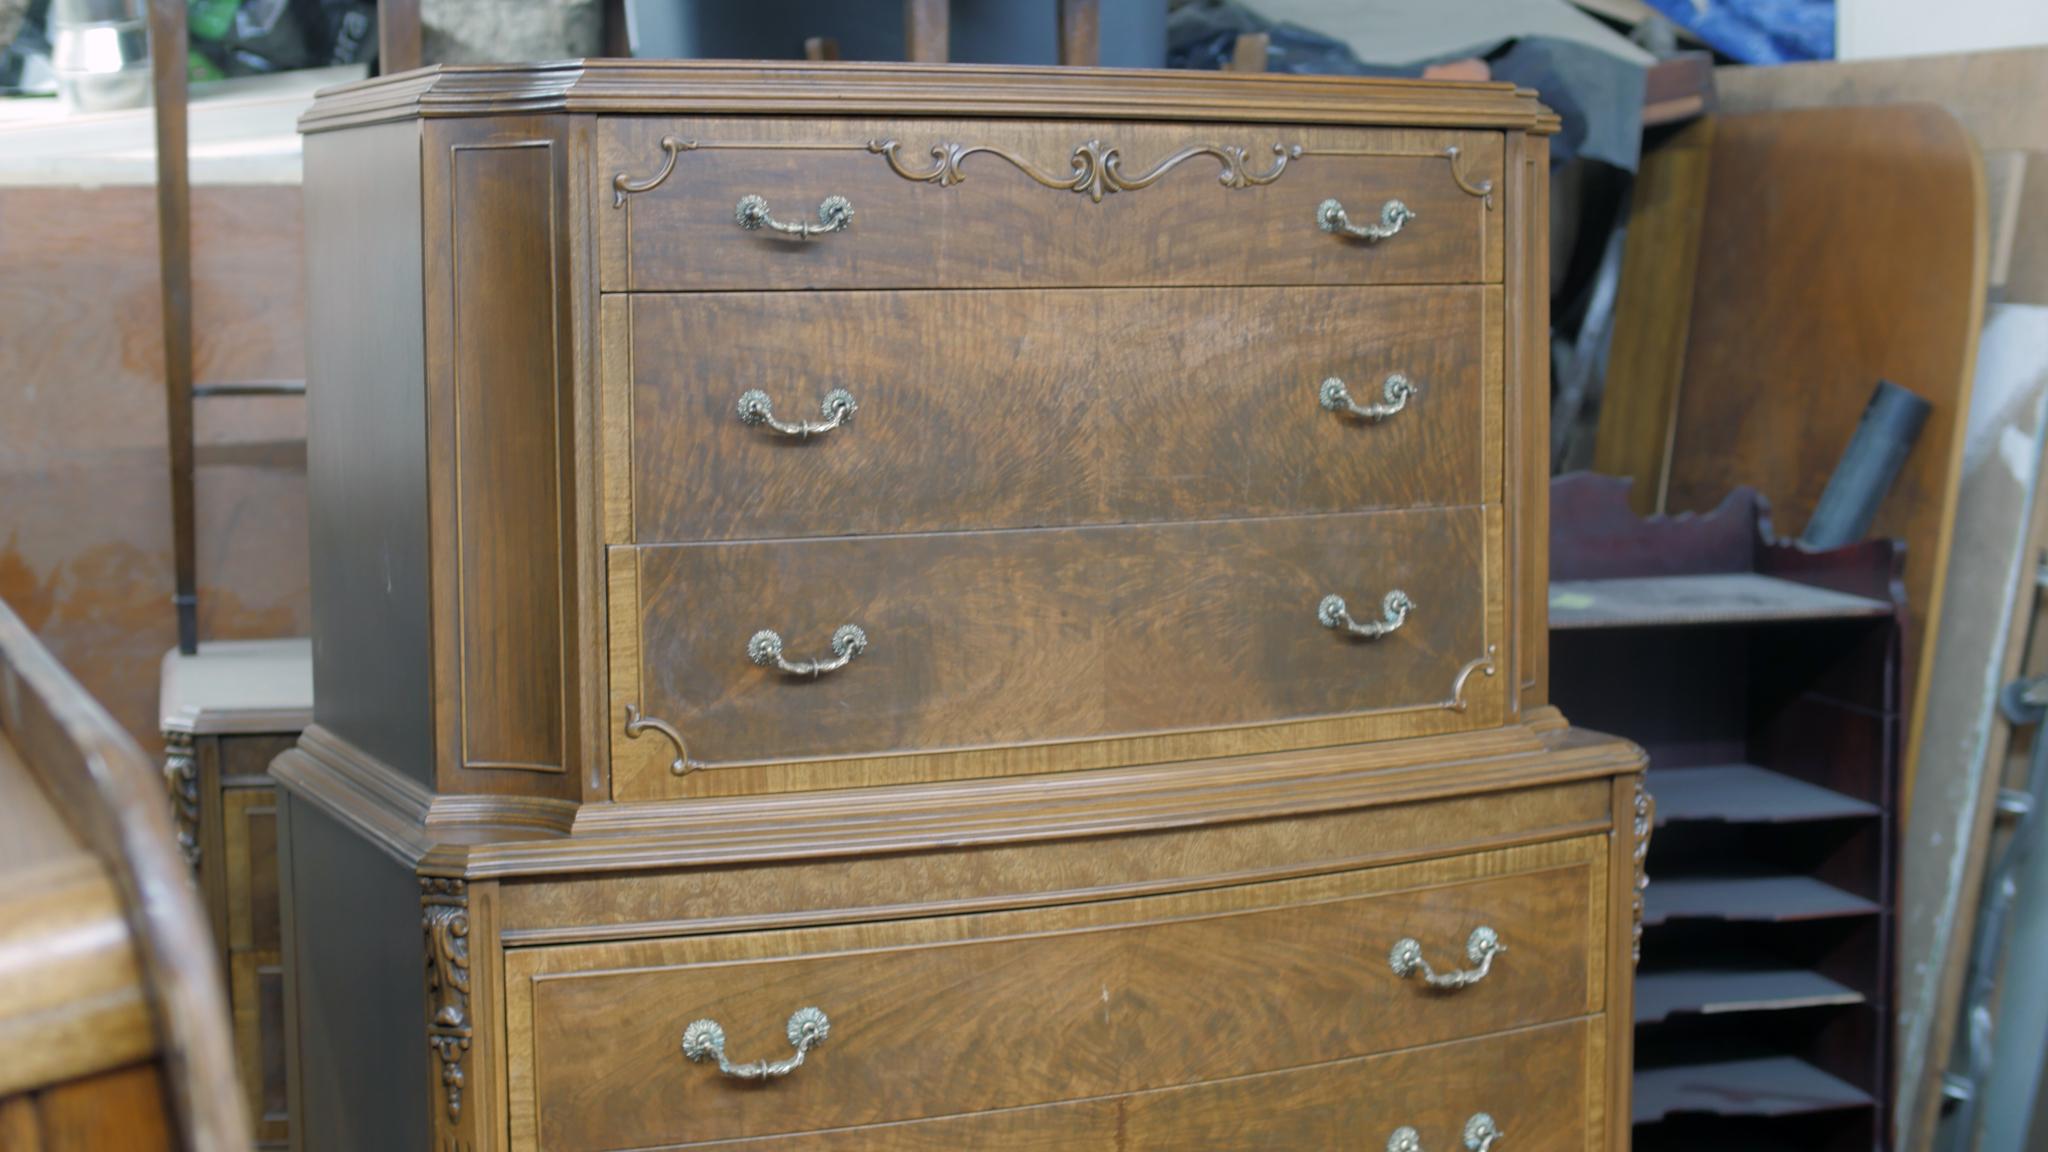 Royal furniture refinishing edmonton ab ourbis for Furniture edmonton